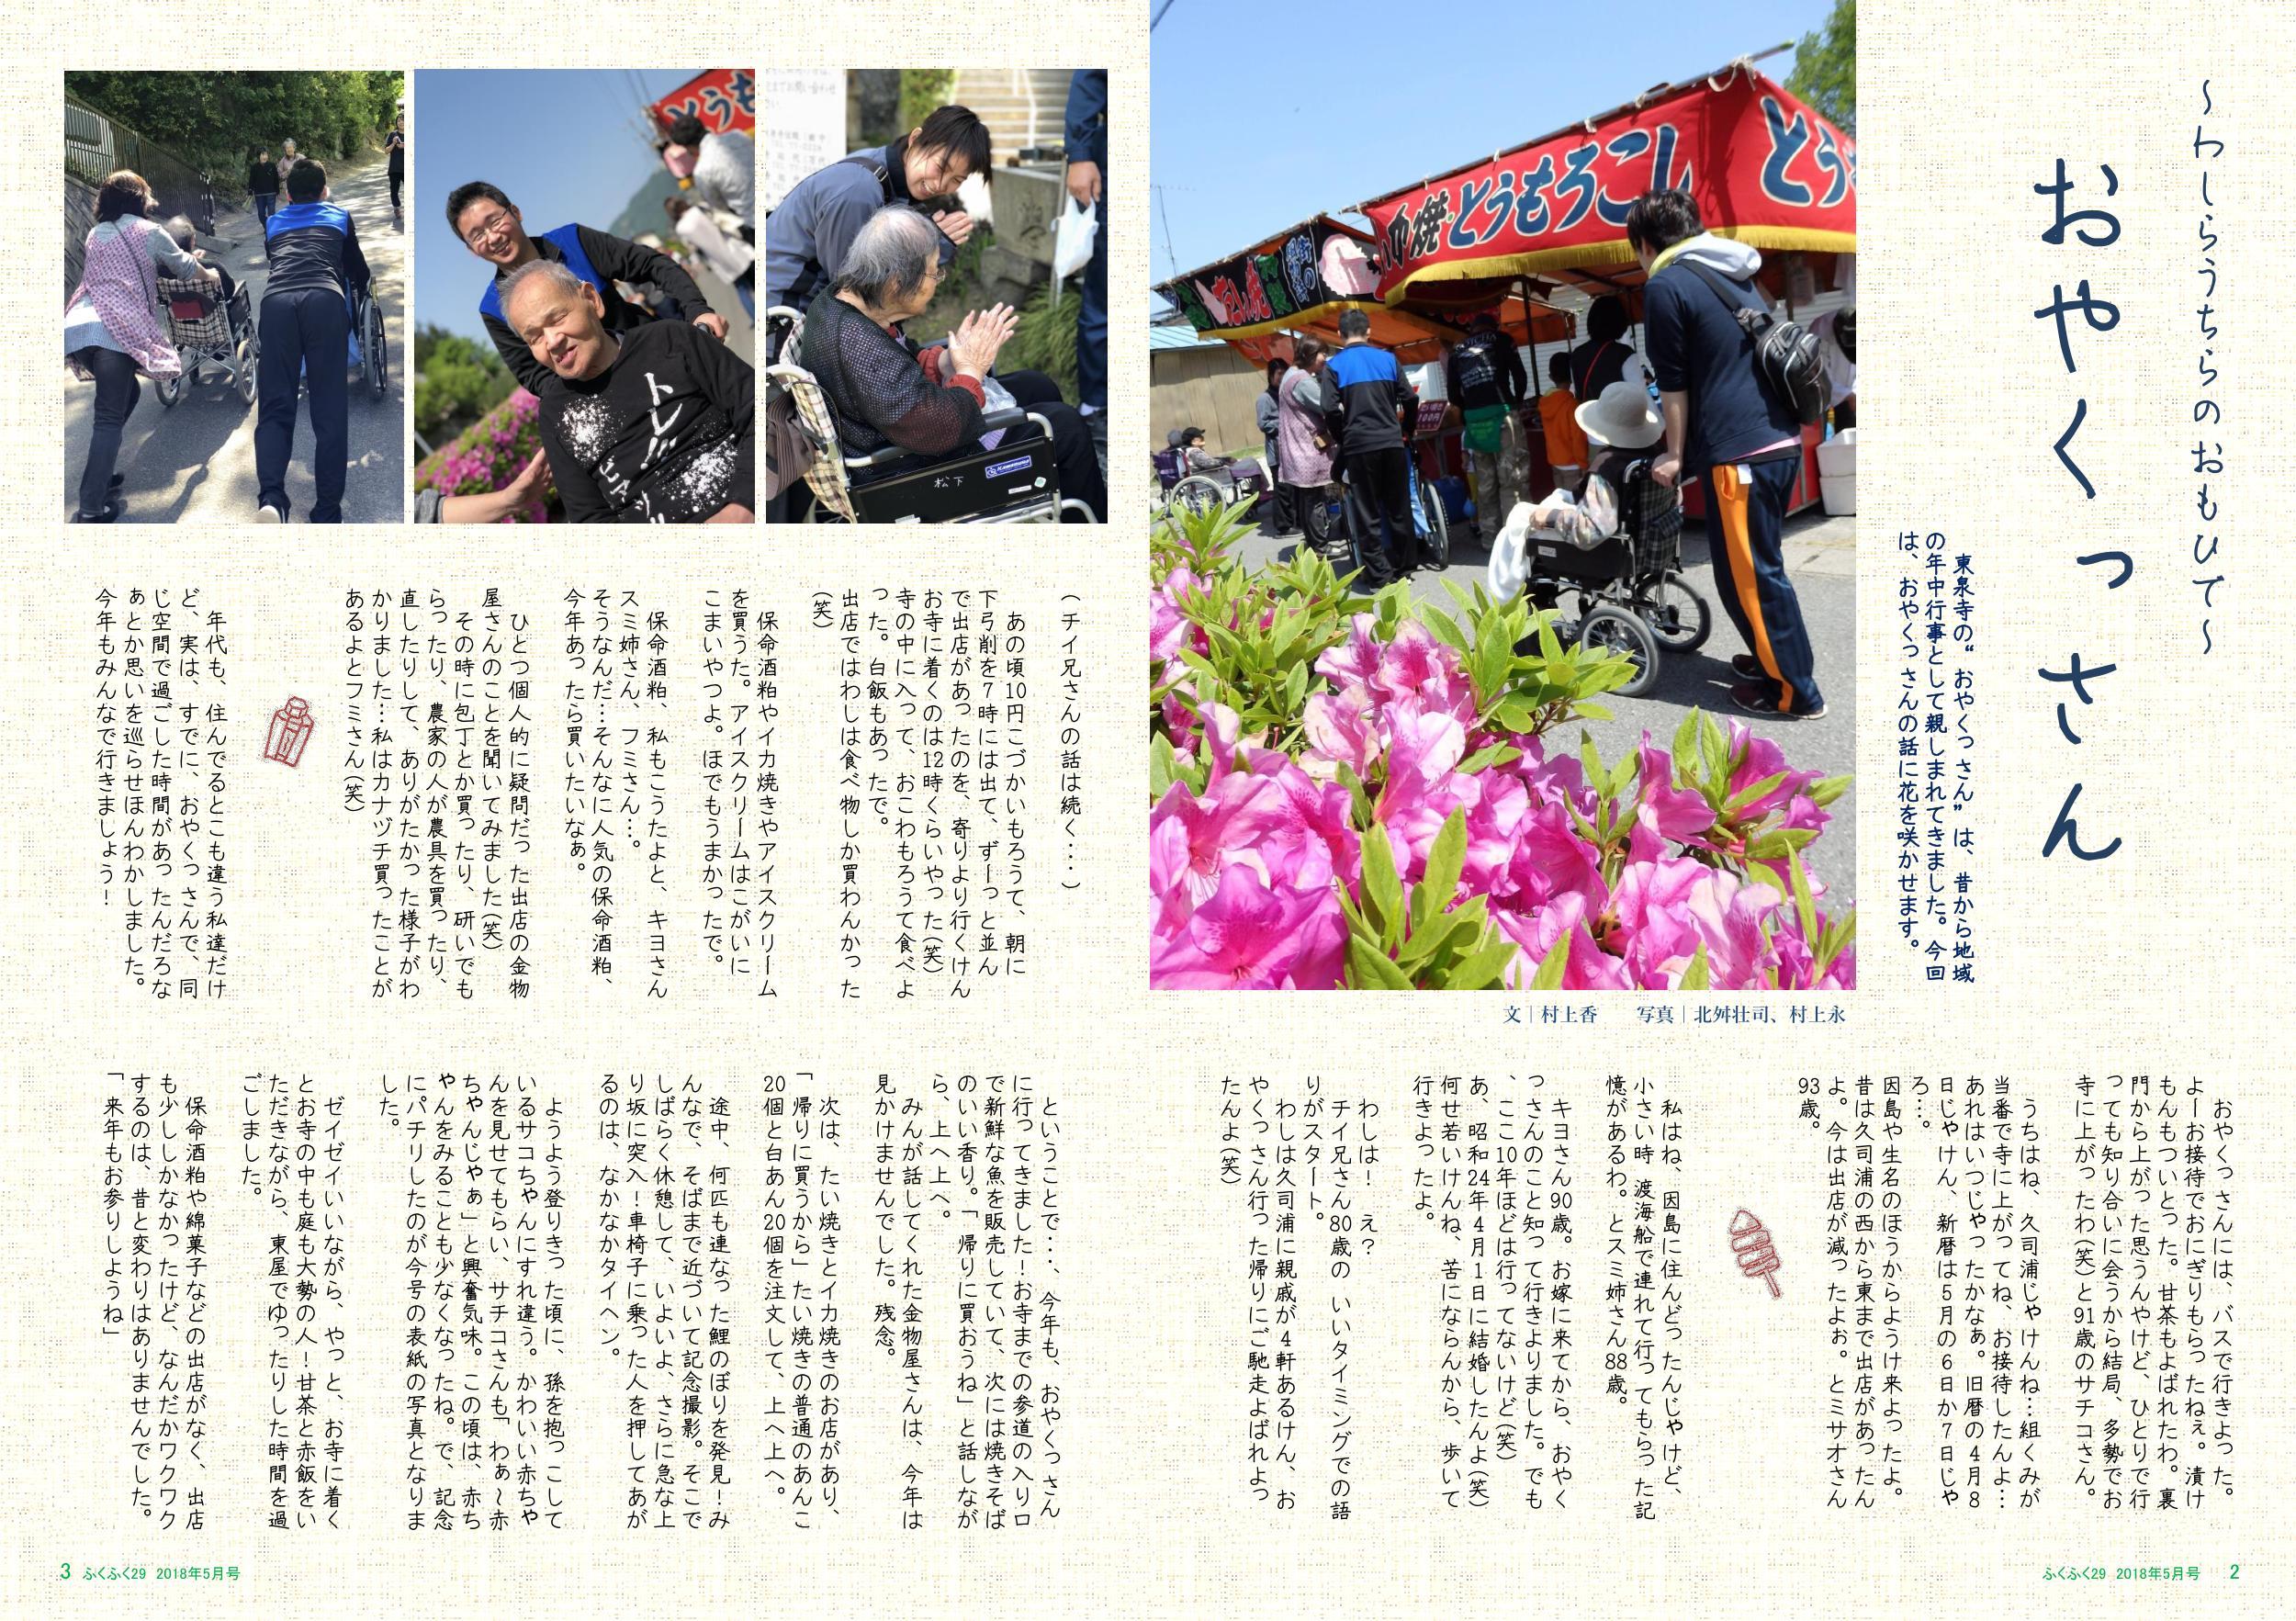 http://fukufukunokai.com/newsletter/images/5%E6%9C%88%E5%8F%B7%E5%85%A5%E7%A8%BF%E5%89%8D_cropped_2.jpeg